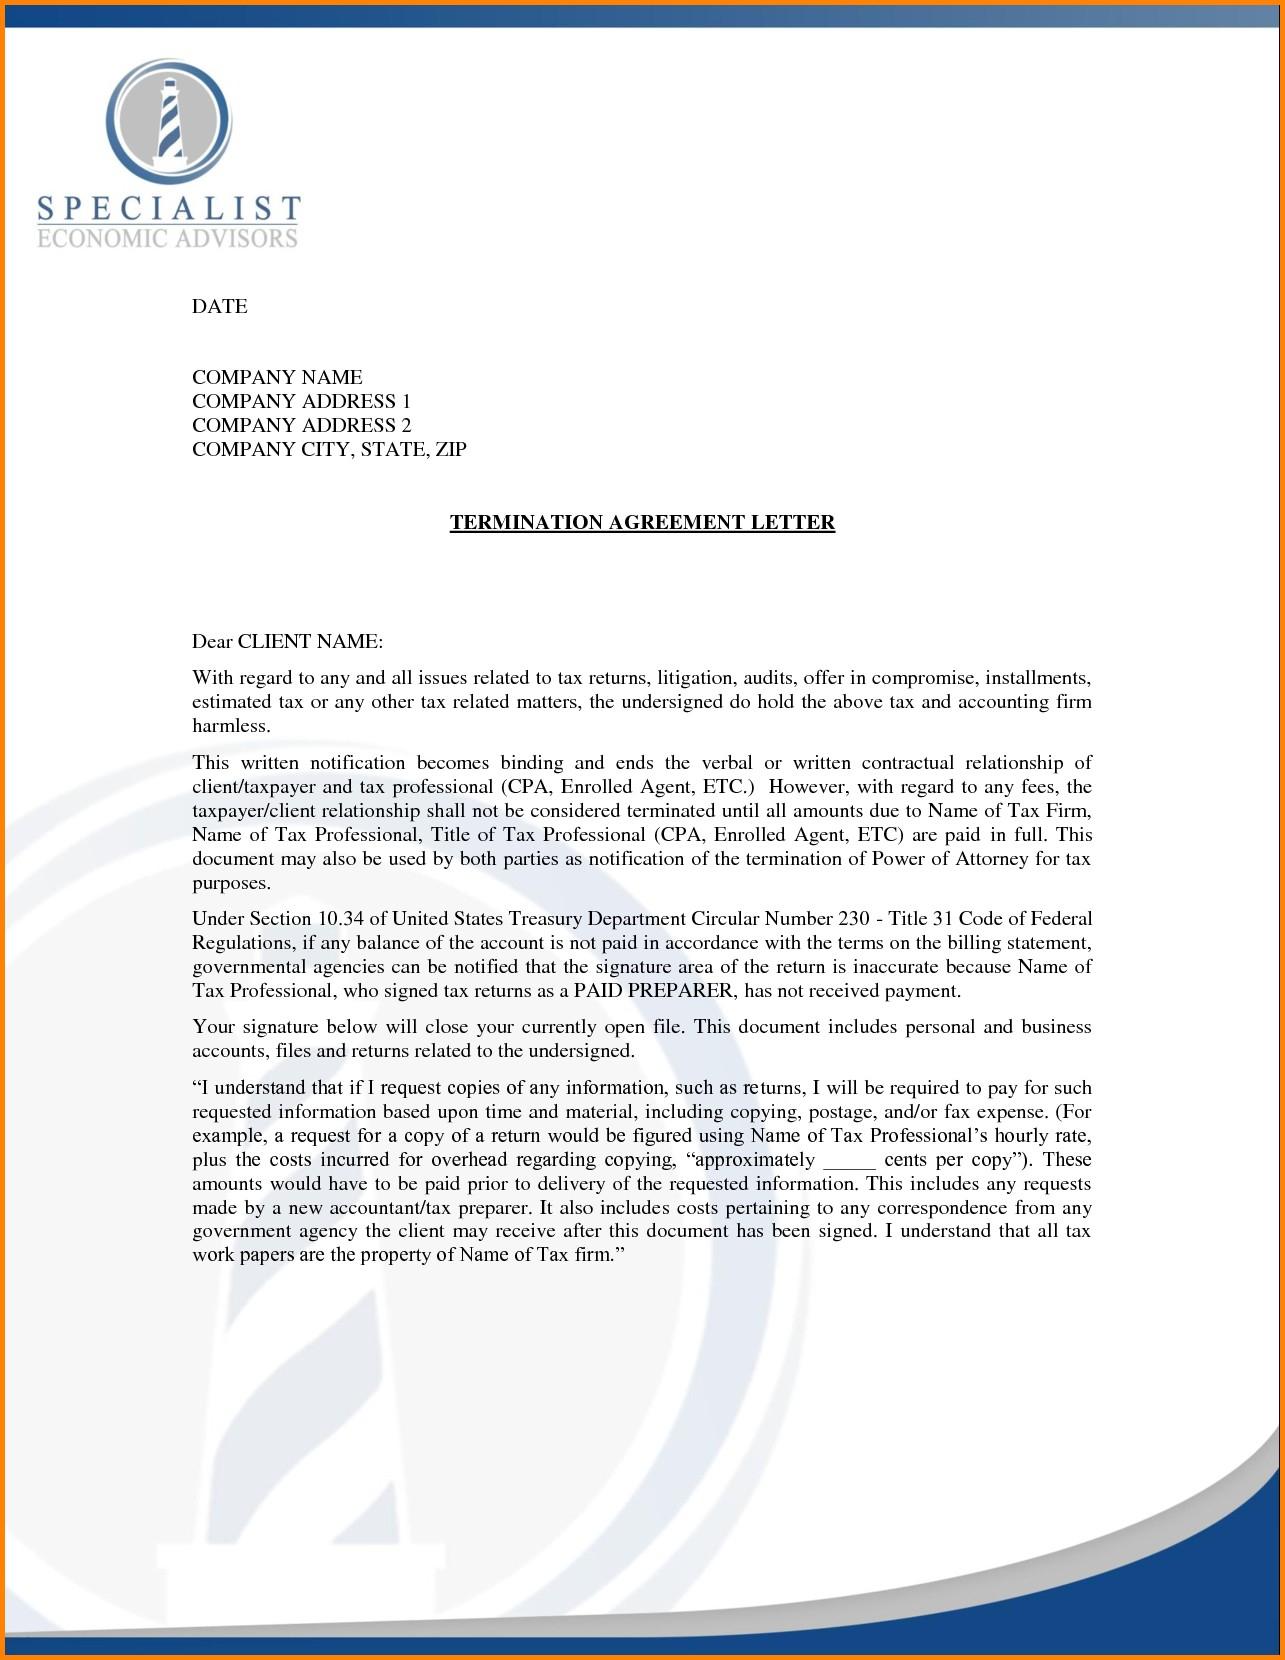 Client Termination Letter Template - Business Letter format for Termination Refrence 2 Termination Letter